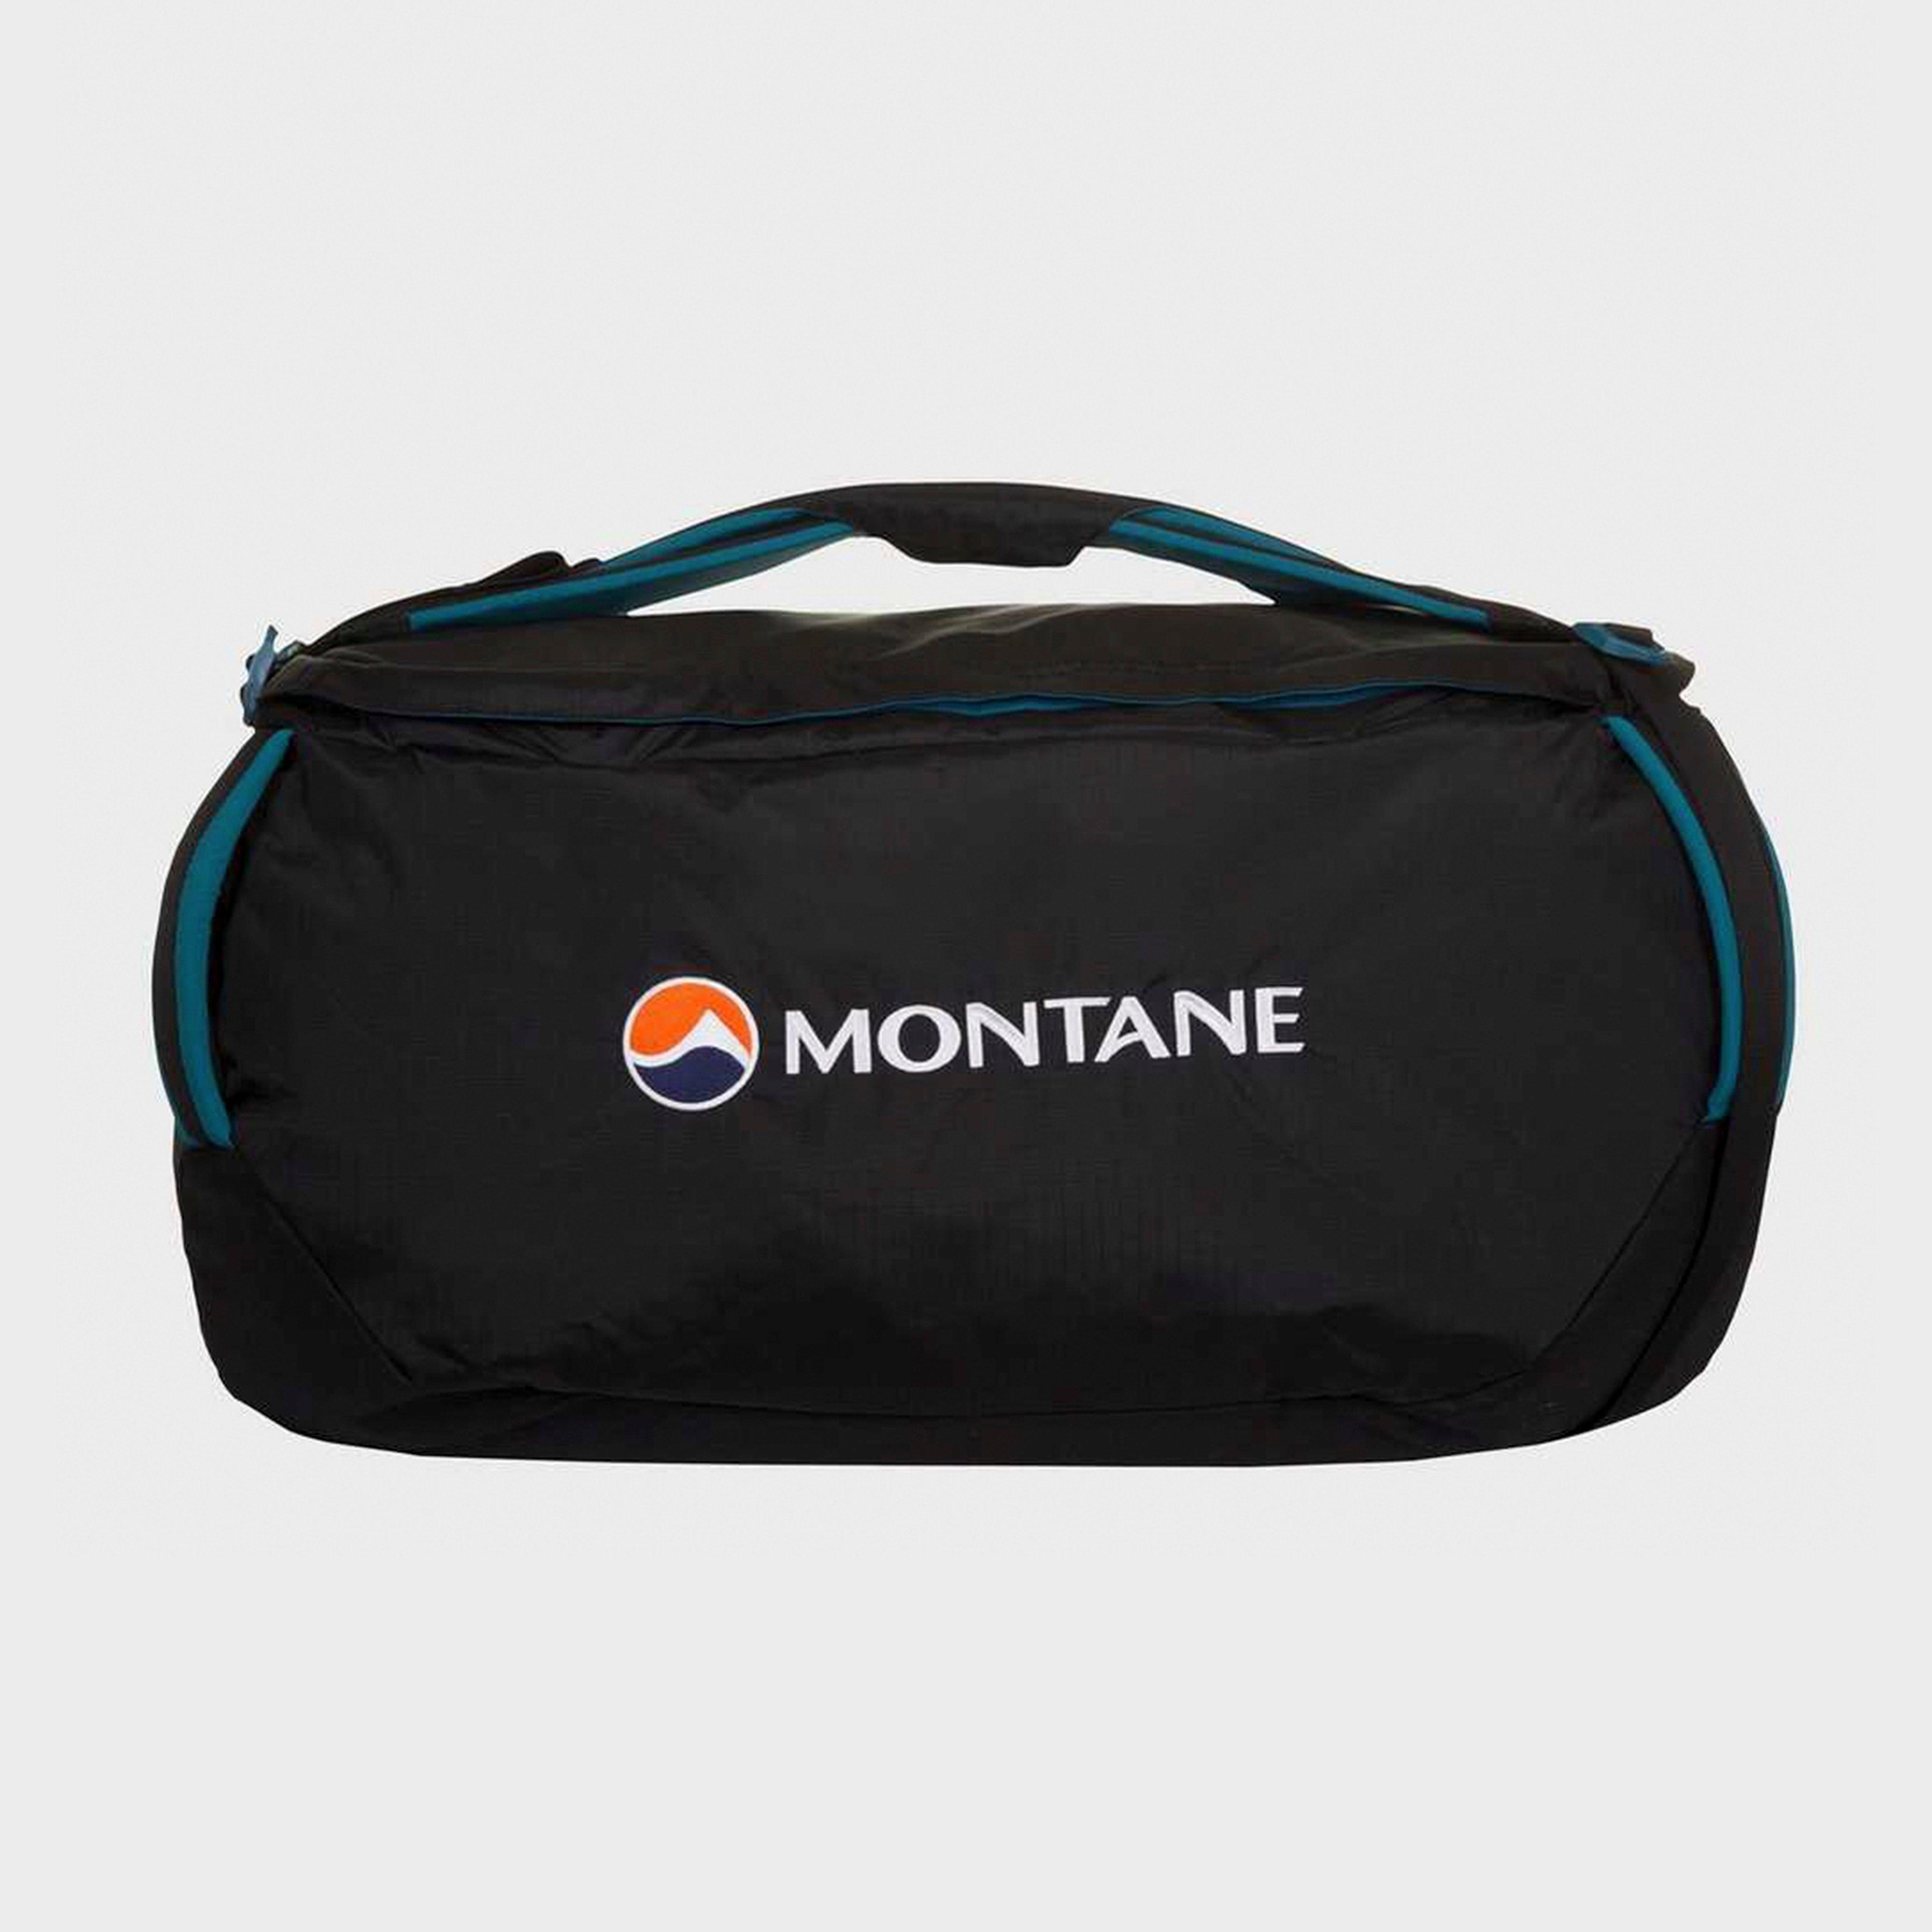 Montane Transition 60 Holdall, Black